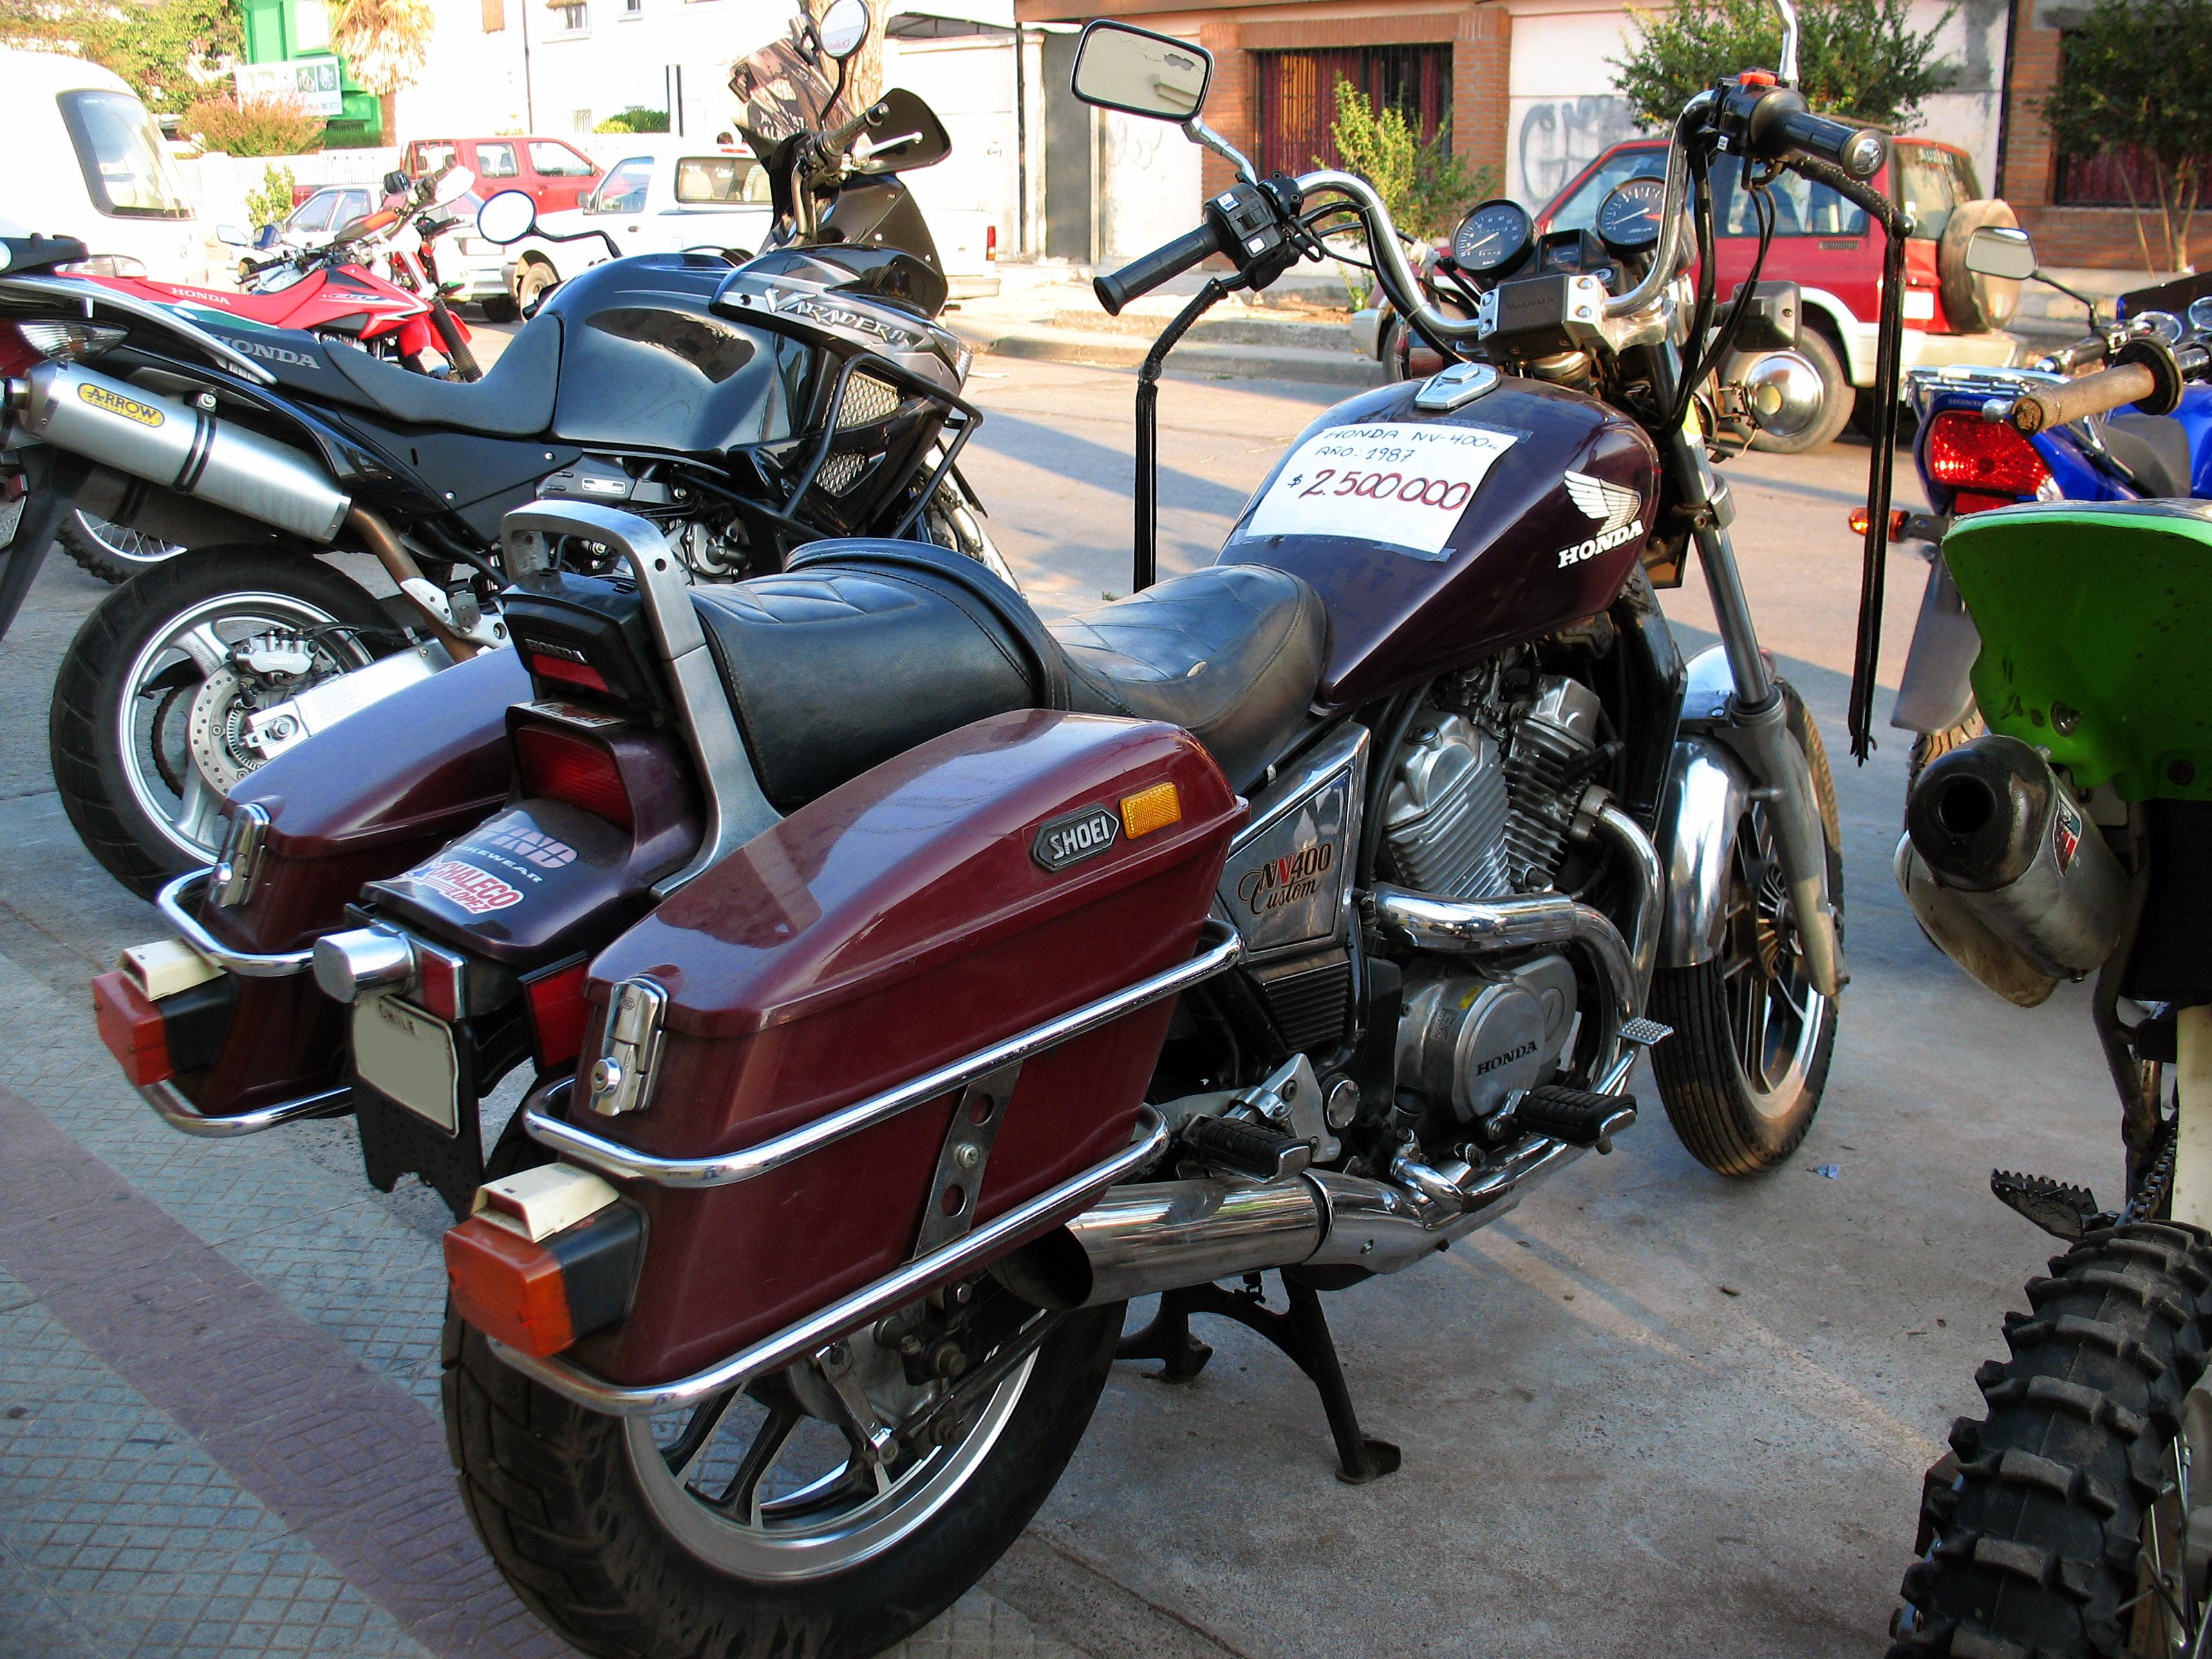 file honda nv 400 custom 1987 16225956894 jpg wikimedia commons rh commons wikimedia org honda nv 400 custom manual honda nv 400 service manual